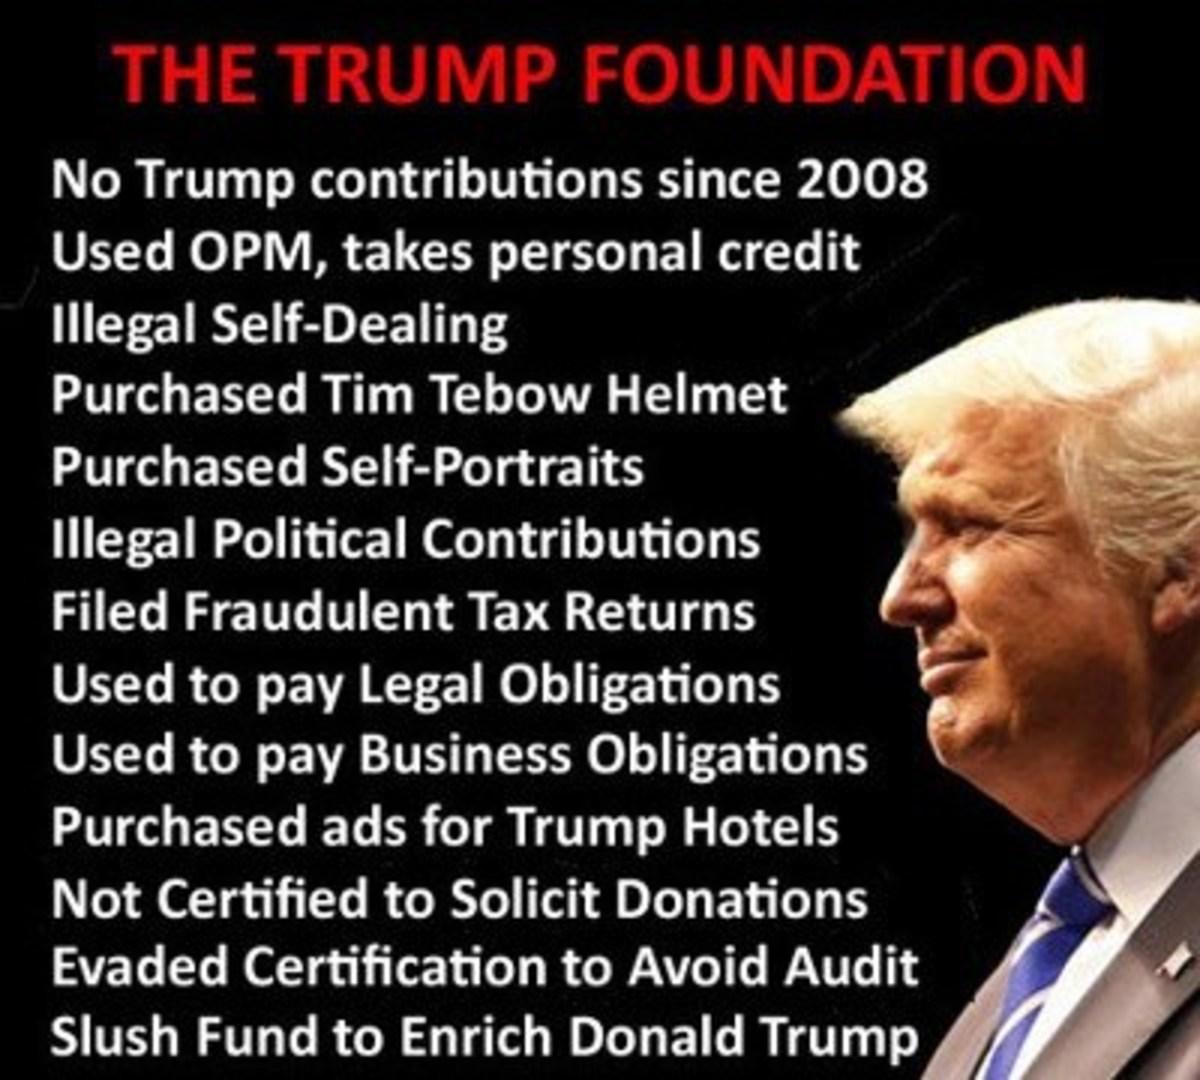 TrumpFoundation4